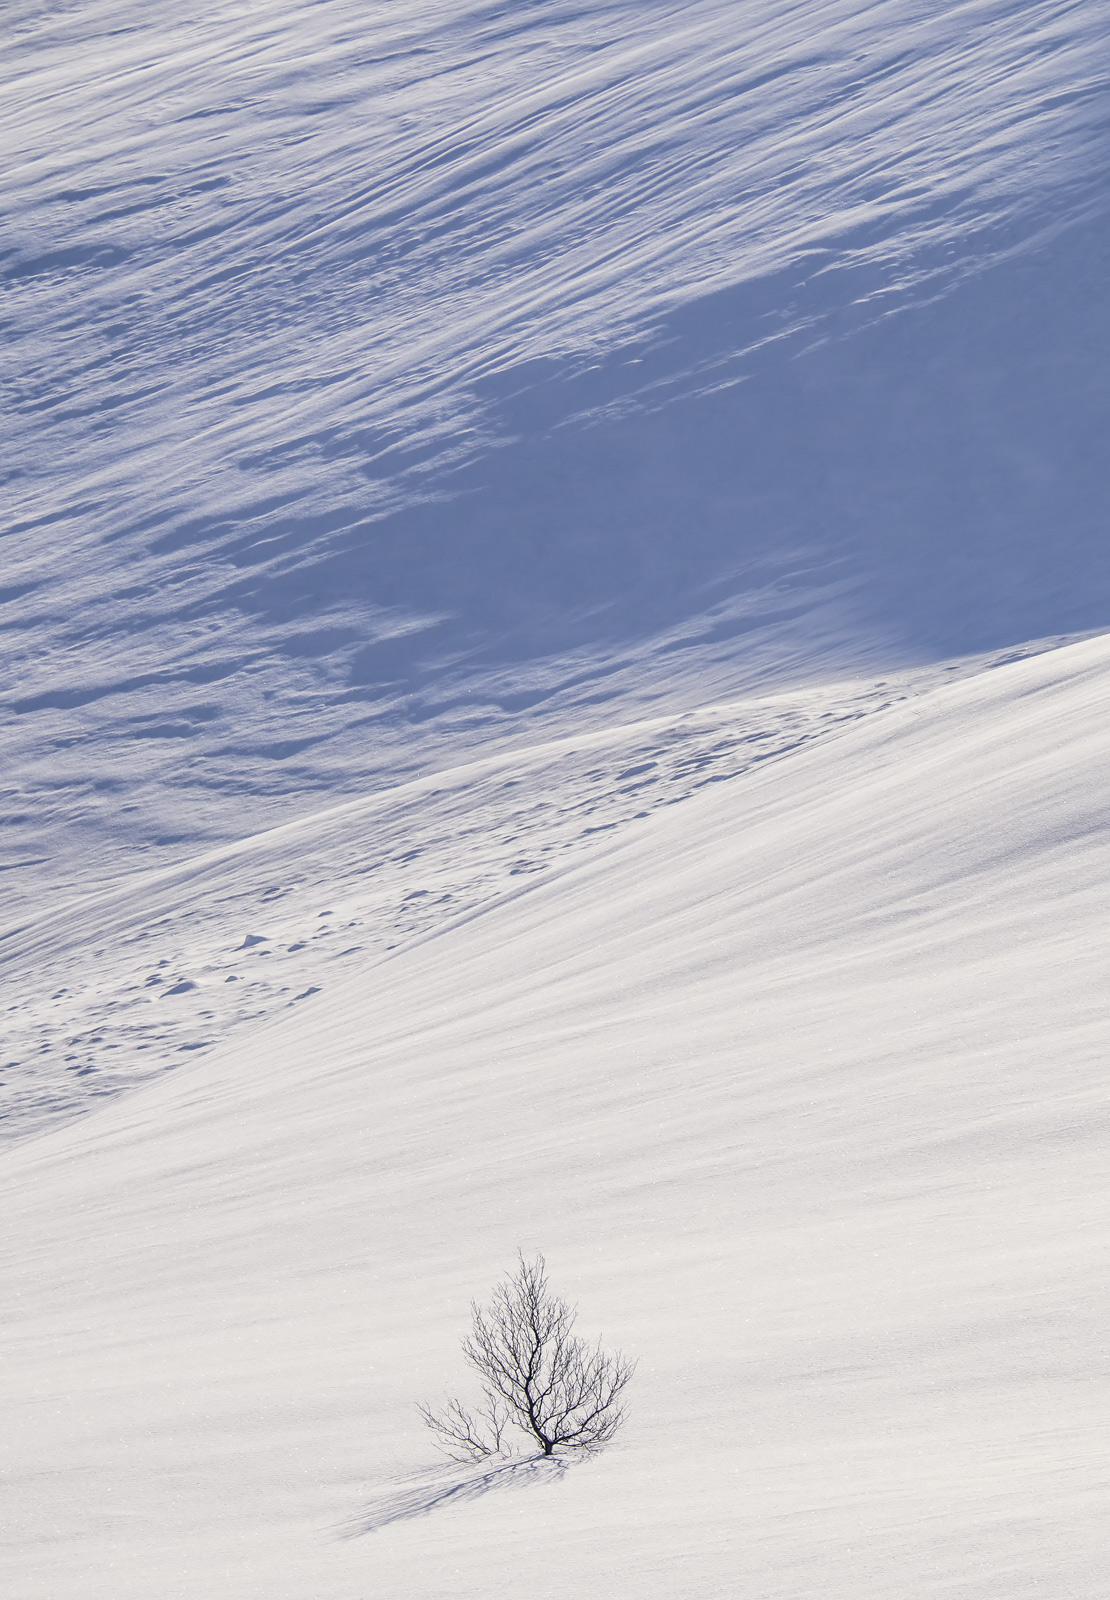 Deep Snow 9, Anderdalan, Senja, Norway, vast, empty, snow, lone, tree, graphics, patterns, geometric, Yin-Yang, unblemis, photo